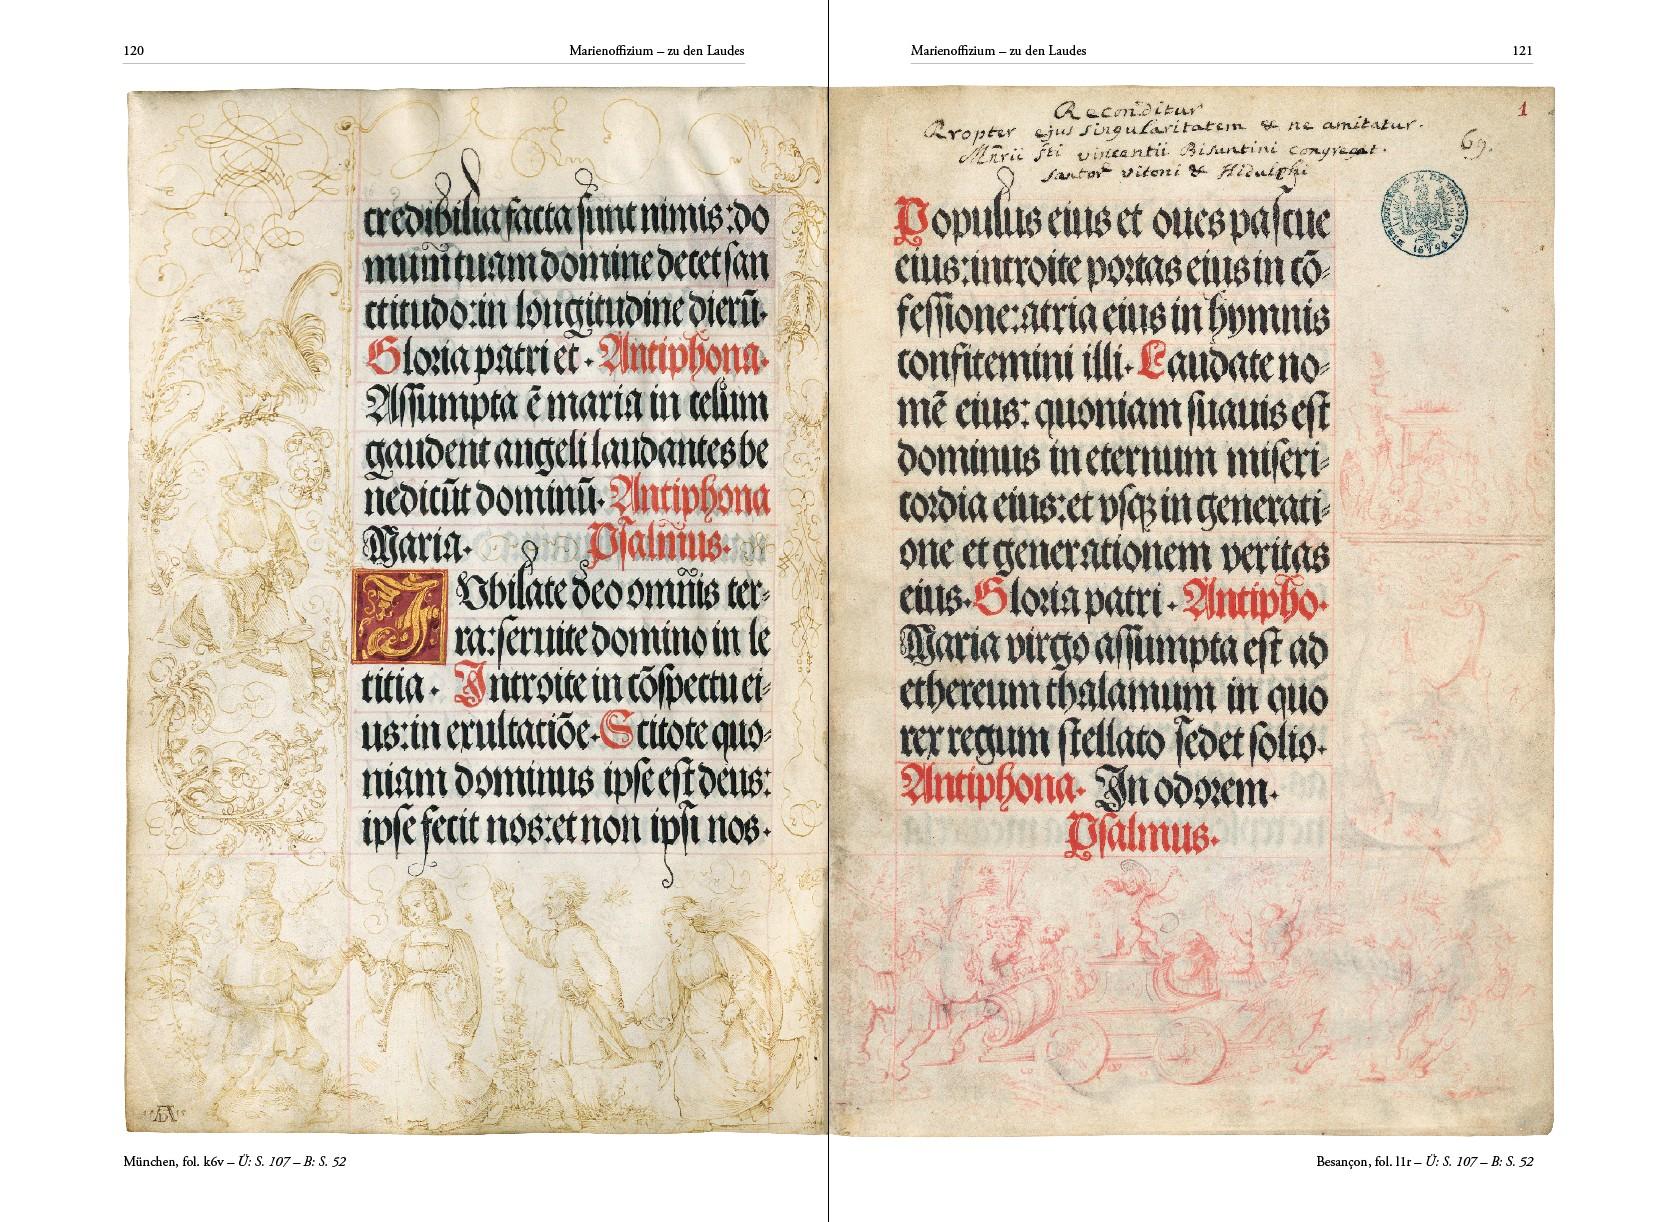 Gebetbuch Kaiser Maximilians I., Kunstbuch-Edition, Bildband, p. 120-121